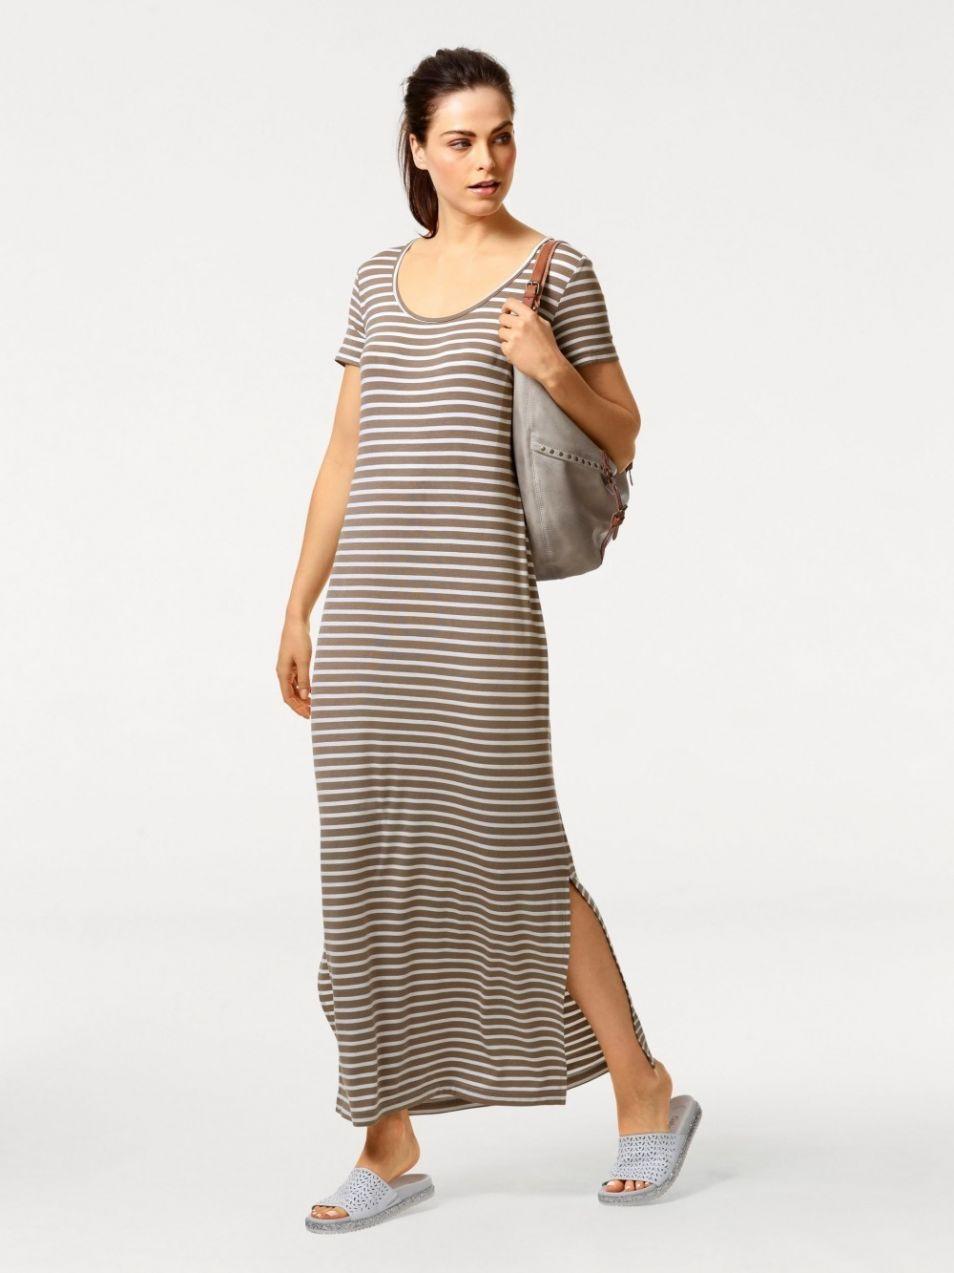 c86105222de B.C. BEST CONNECTIONS by Heine Pruhované džersejové šaty